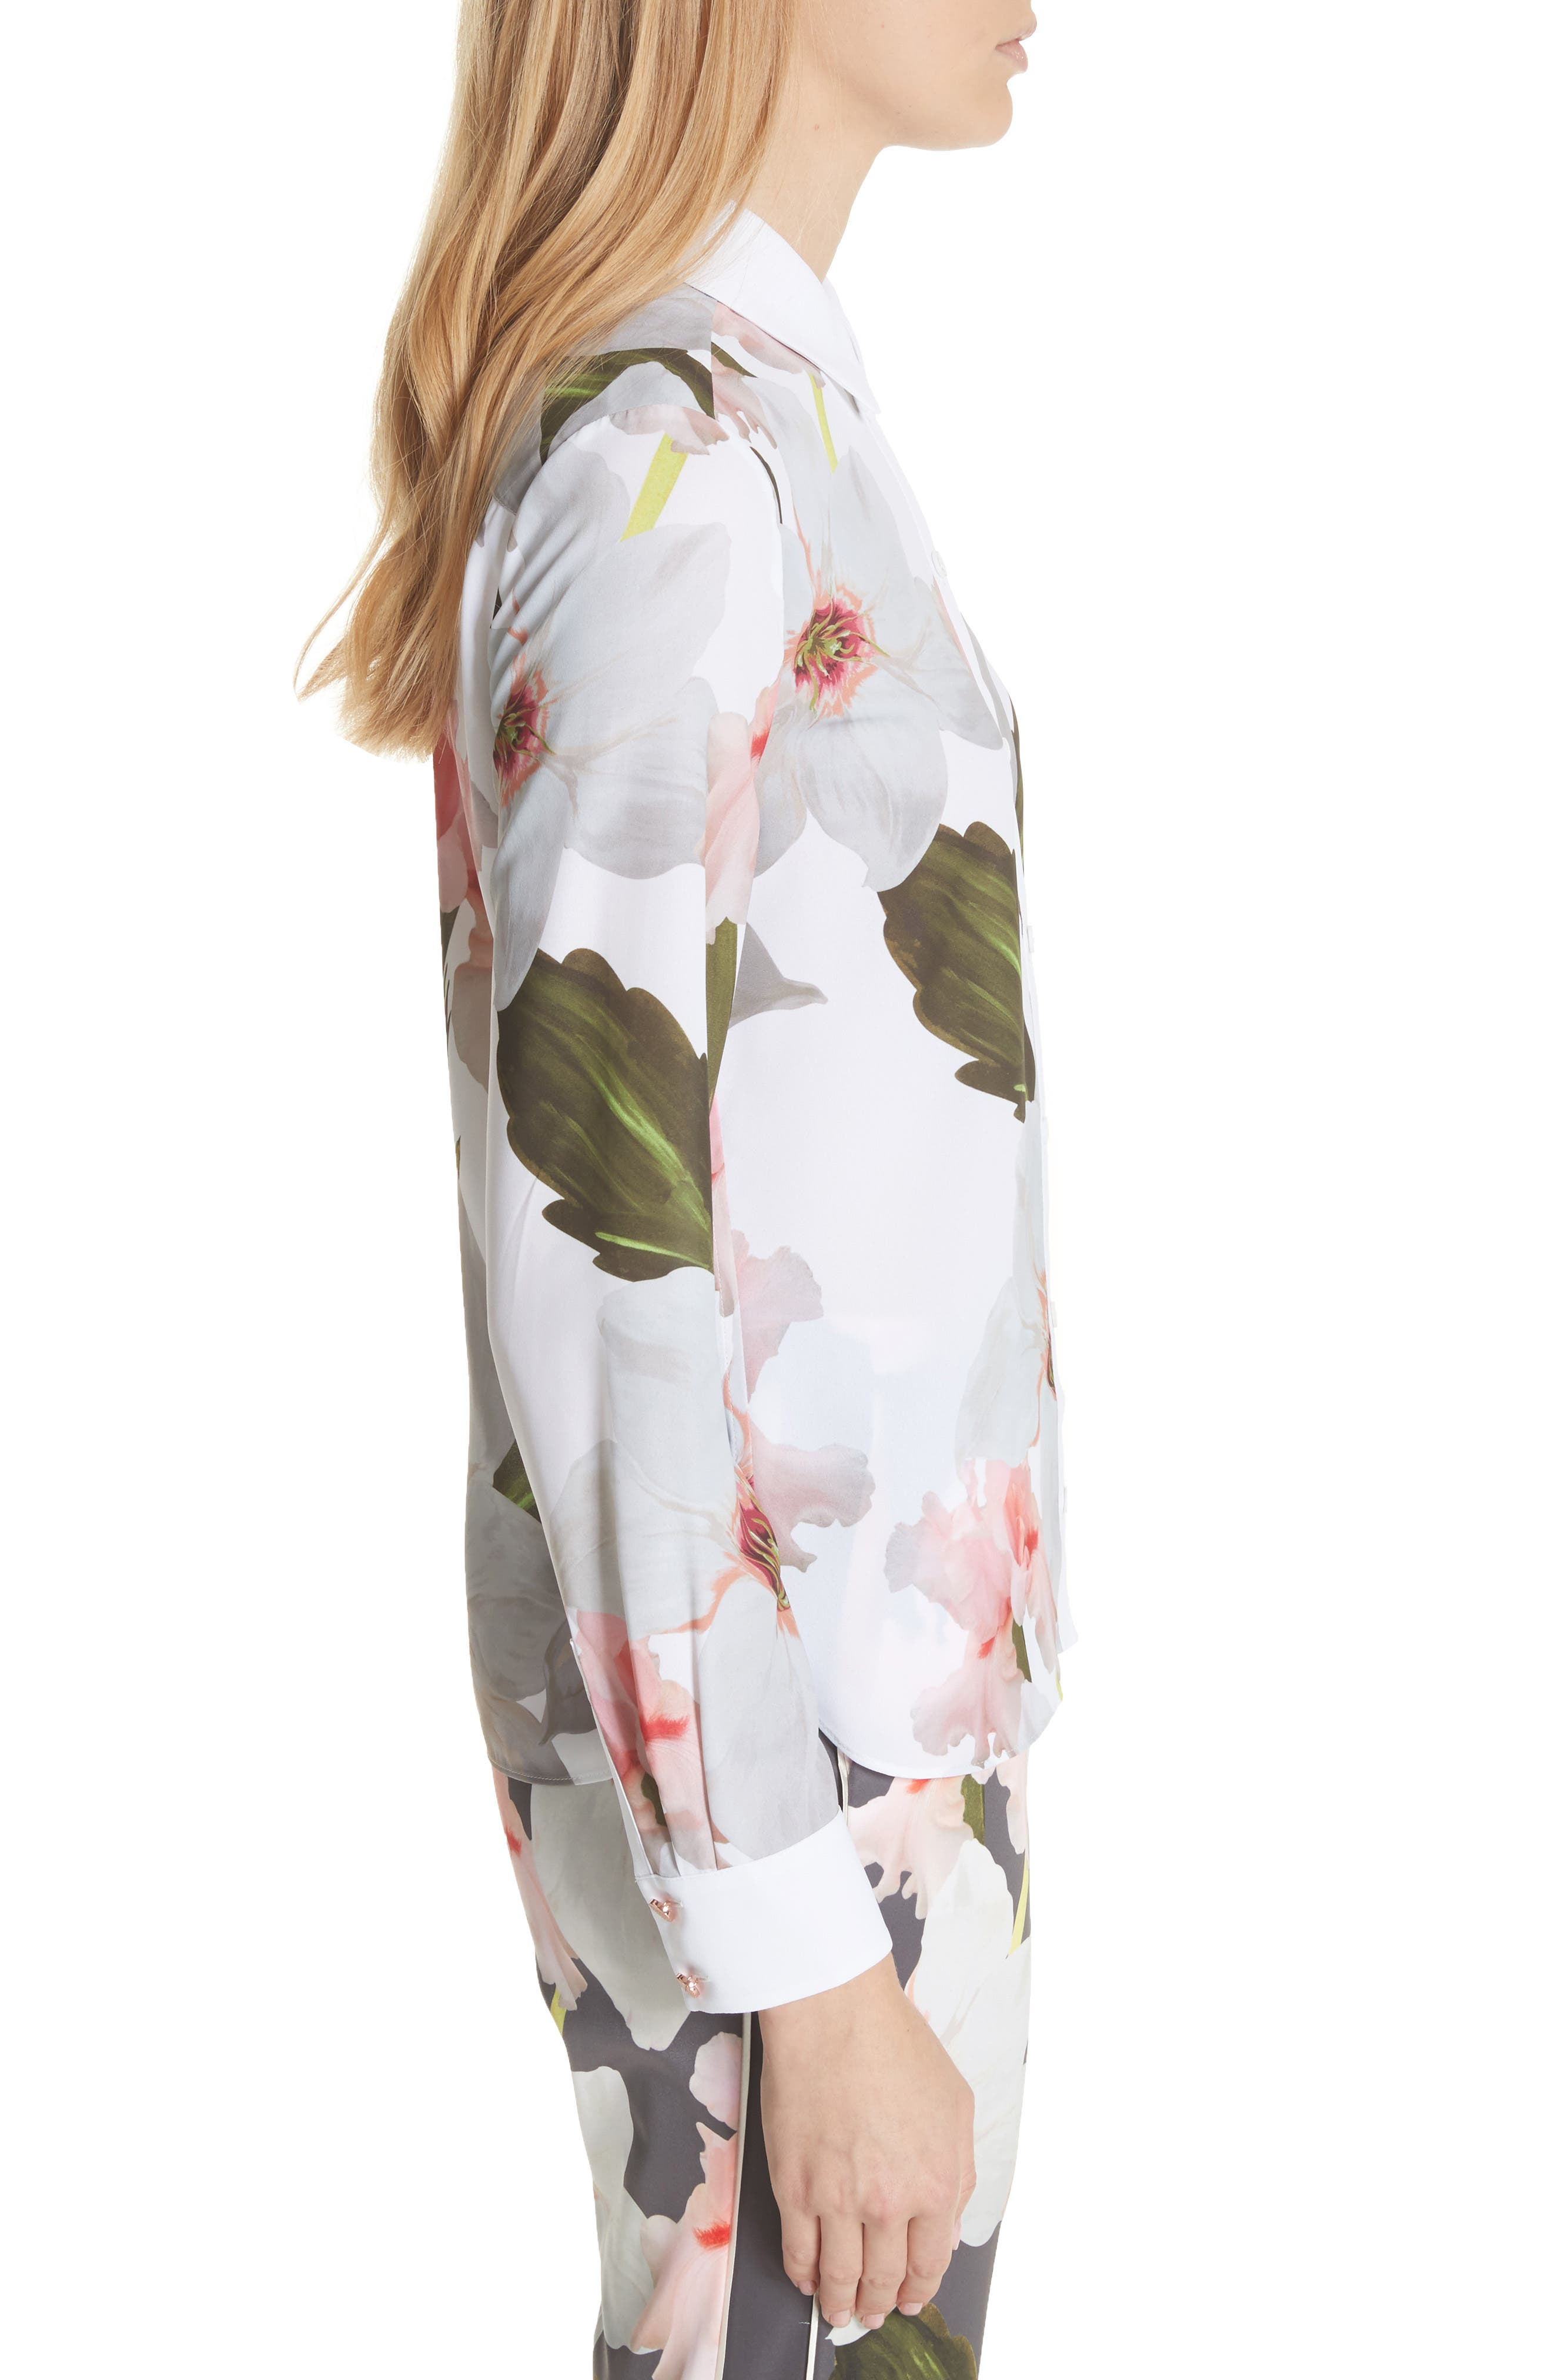 Chatsworth Bloom Shirt,                             Alternate thumbnail 3, color,                             White